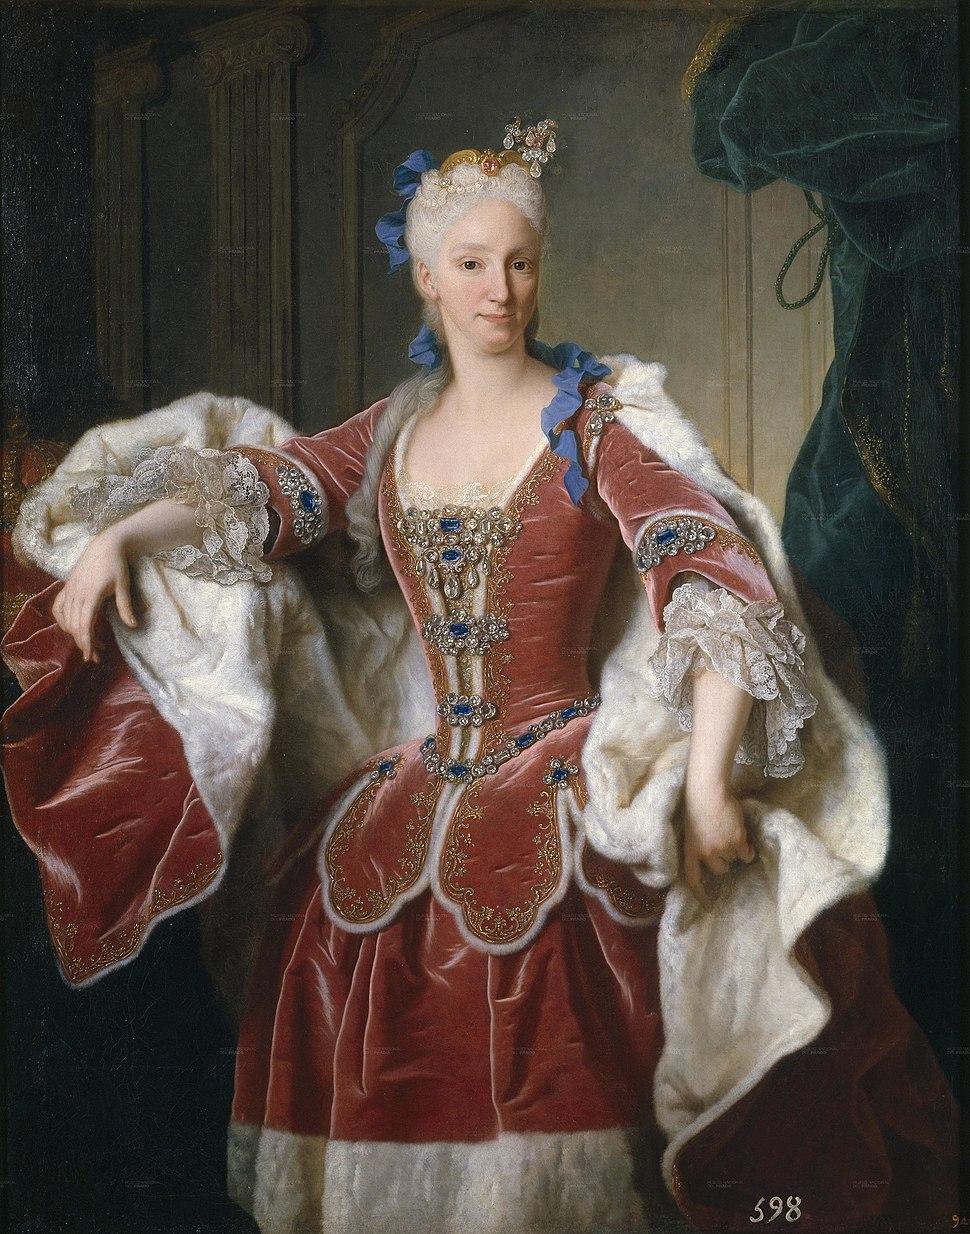 Isabel de Parma